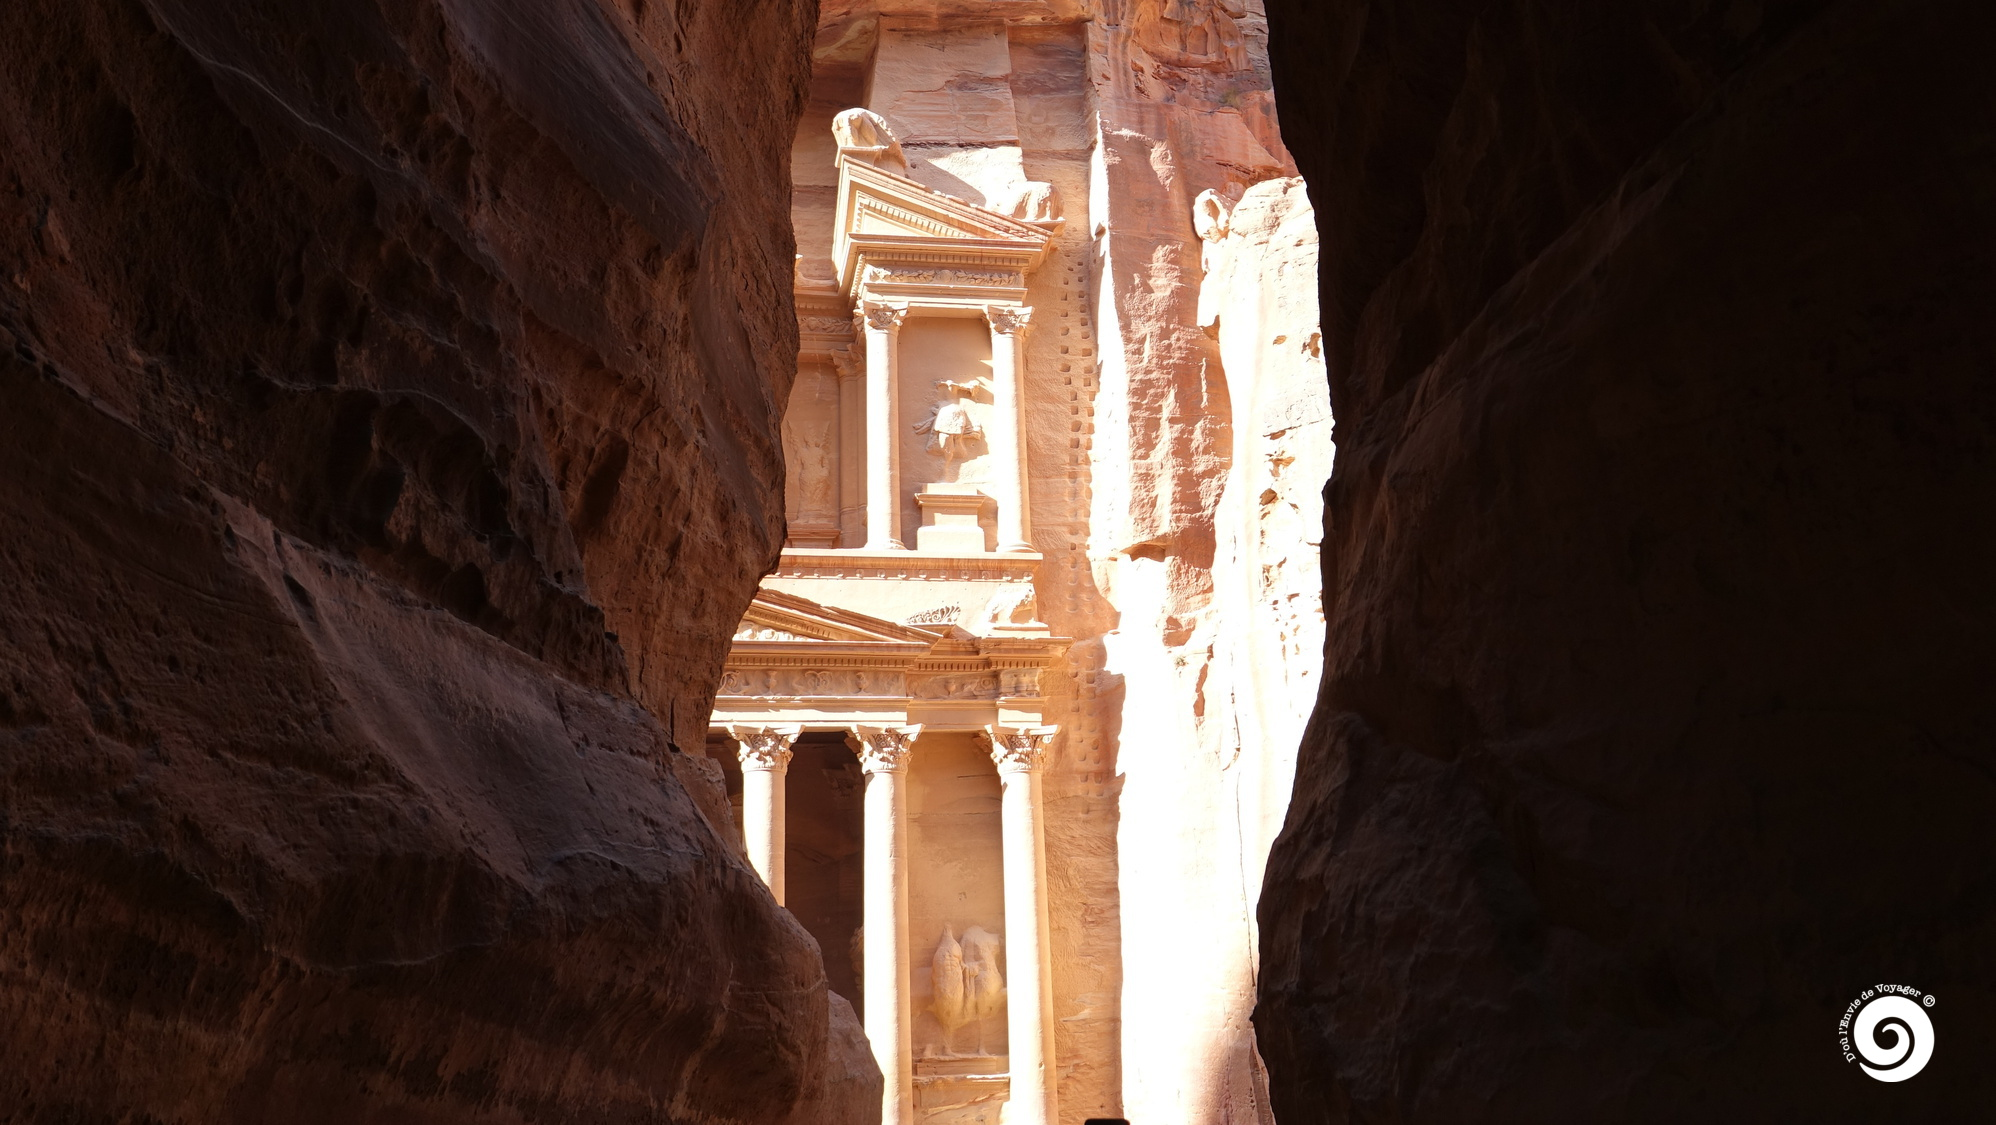 D'où l'Envie de Voyager - Petra